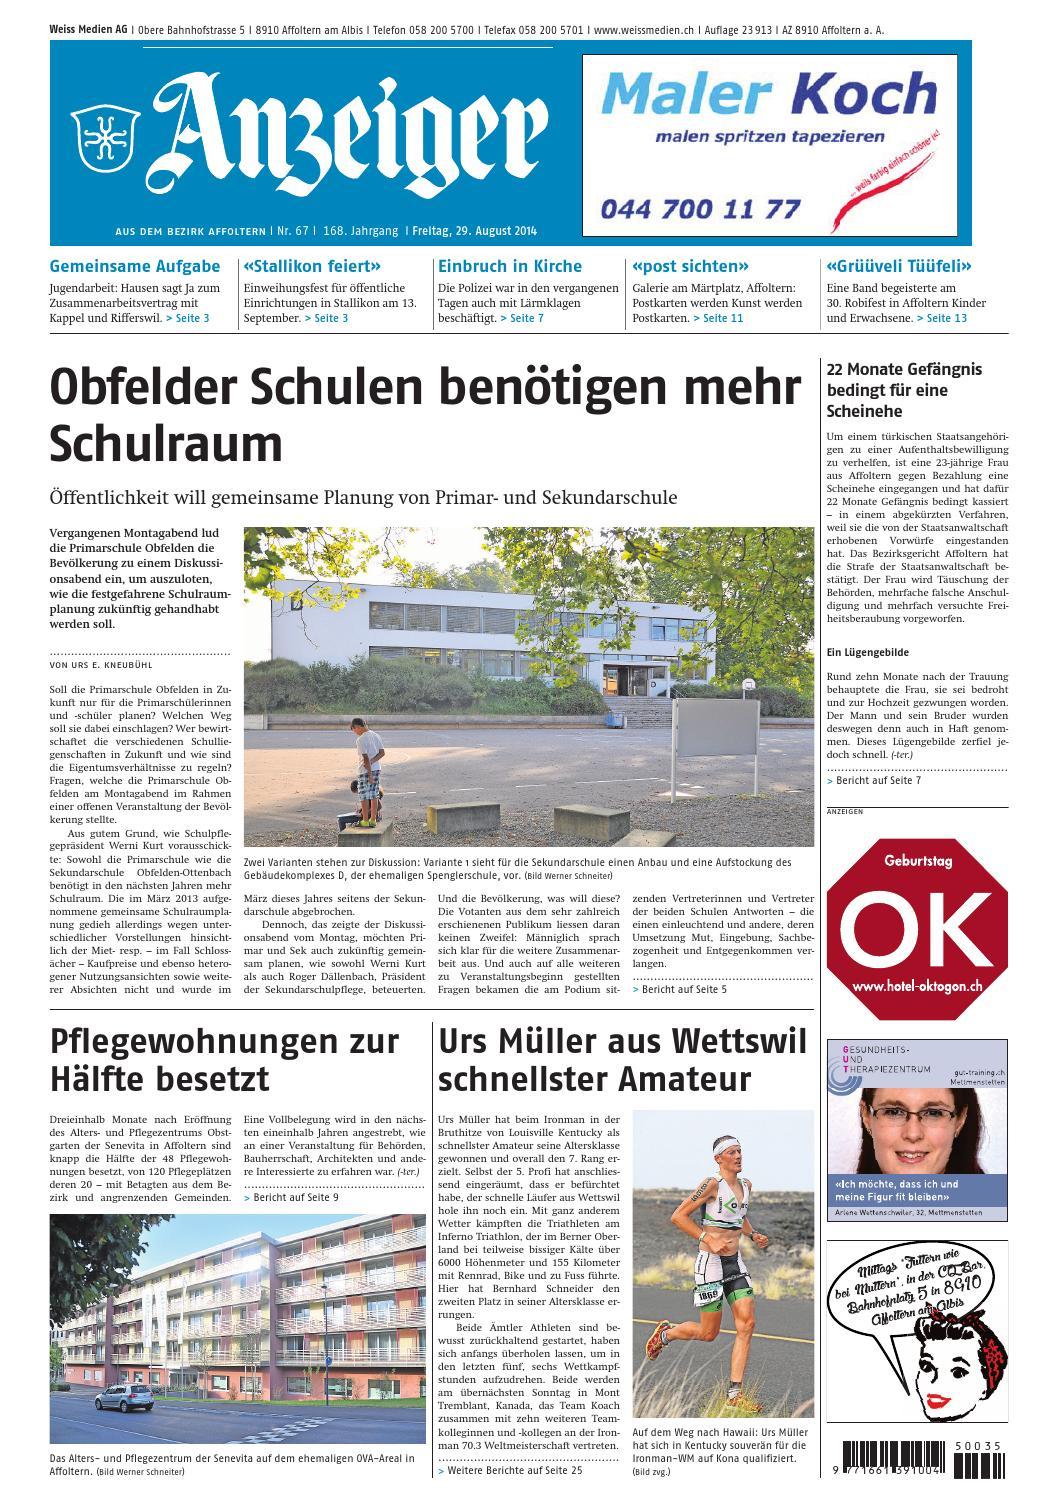 067 2014 by AZ-Anzeiger - issuu